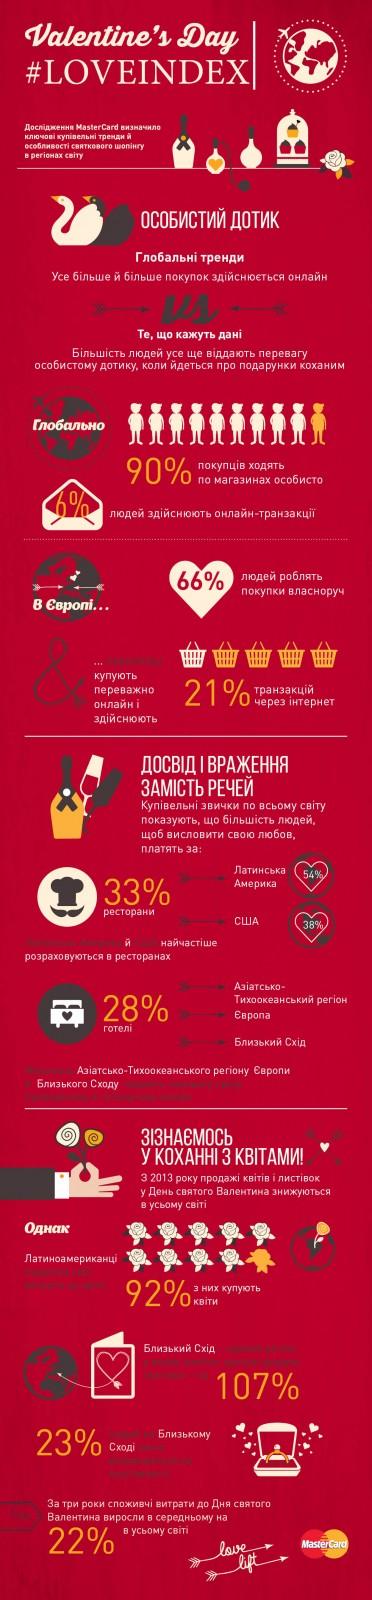 Mastercard_Valentine_Infographic